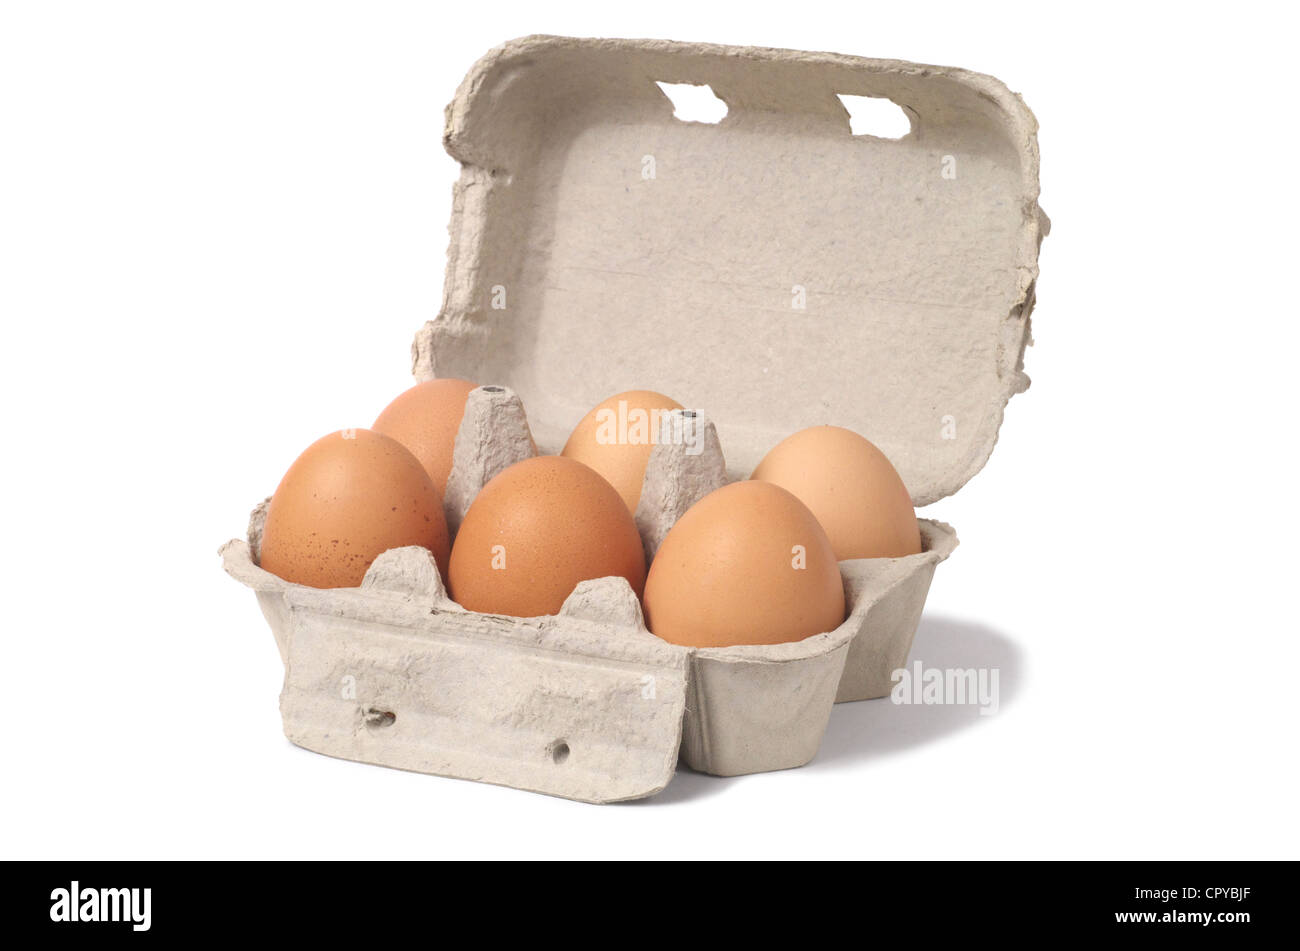 Eggs on White - Stock Image